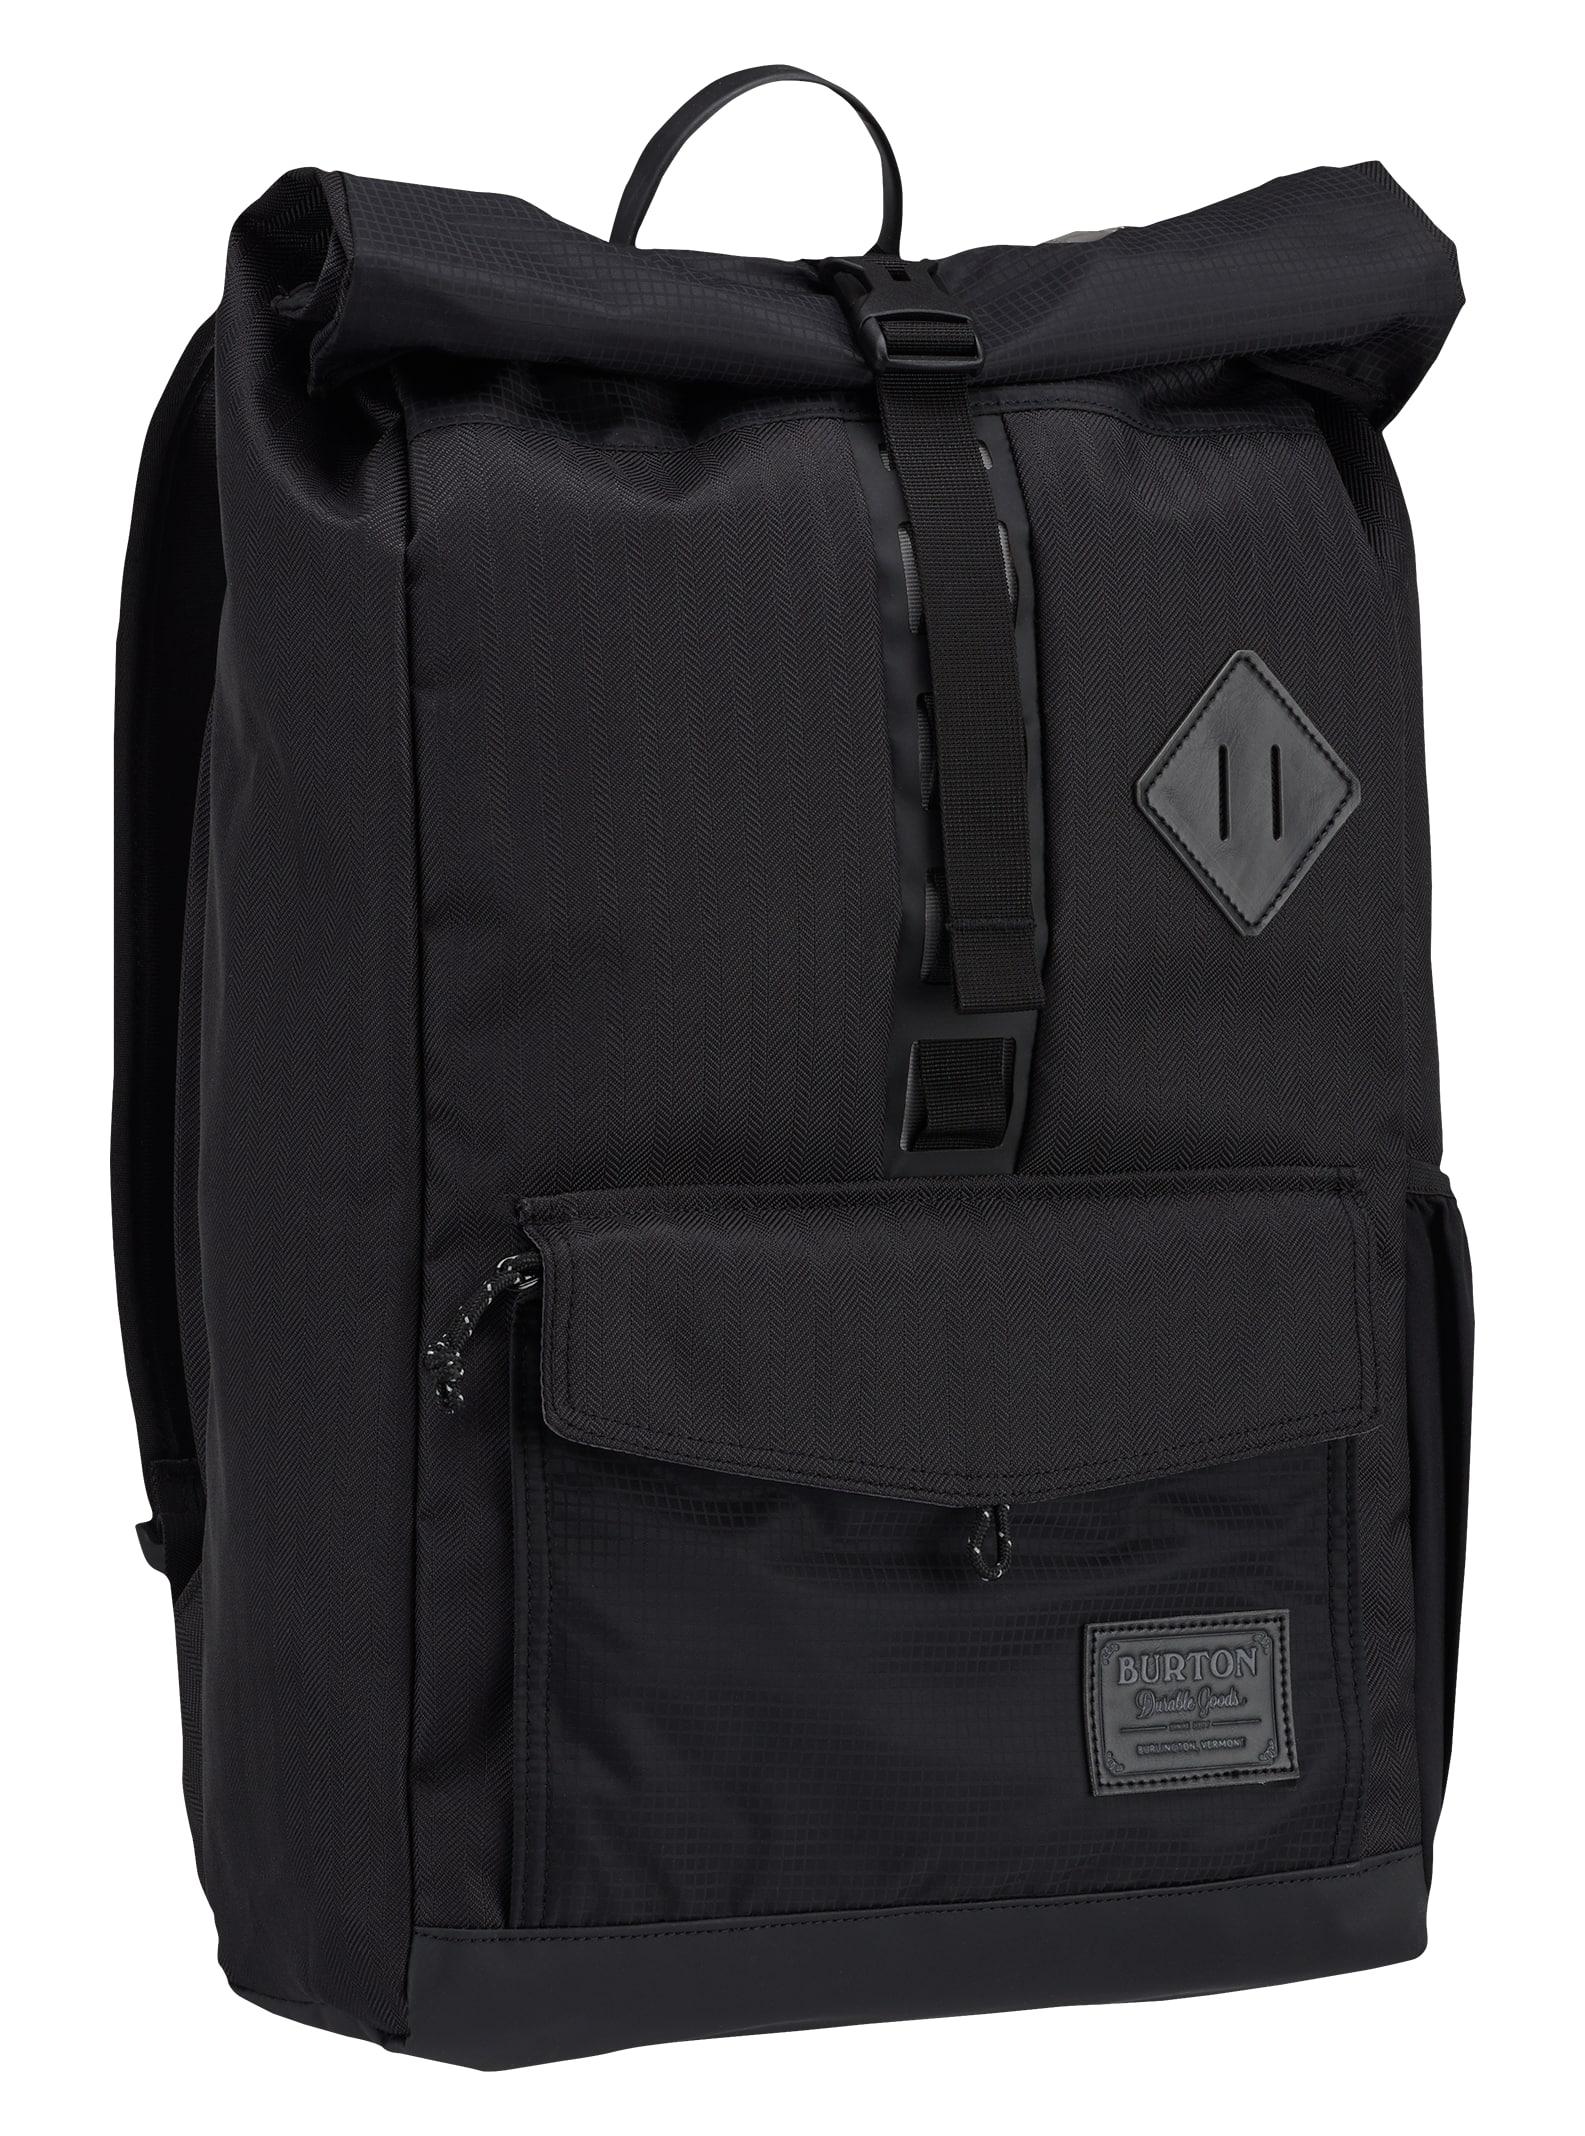 8da051f08 Burton Export Backpack | Burton Snowboards Fall 2017